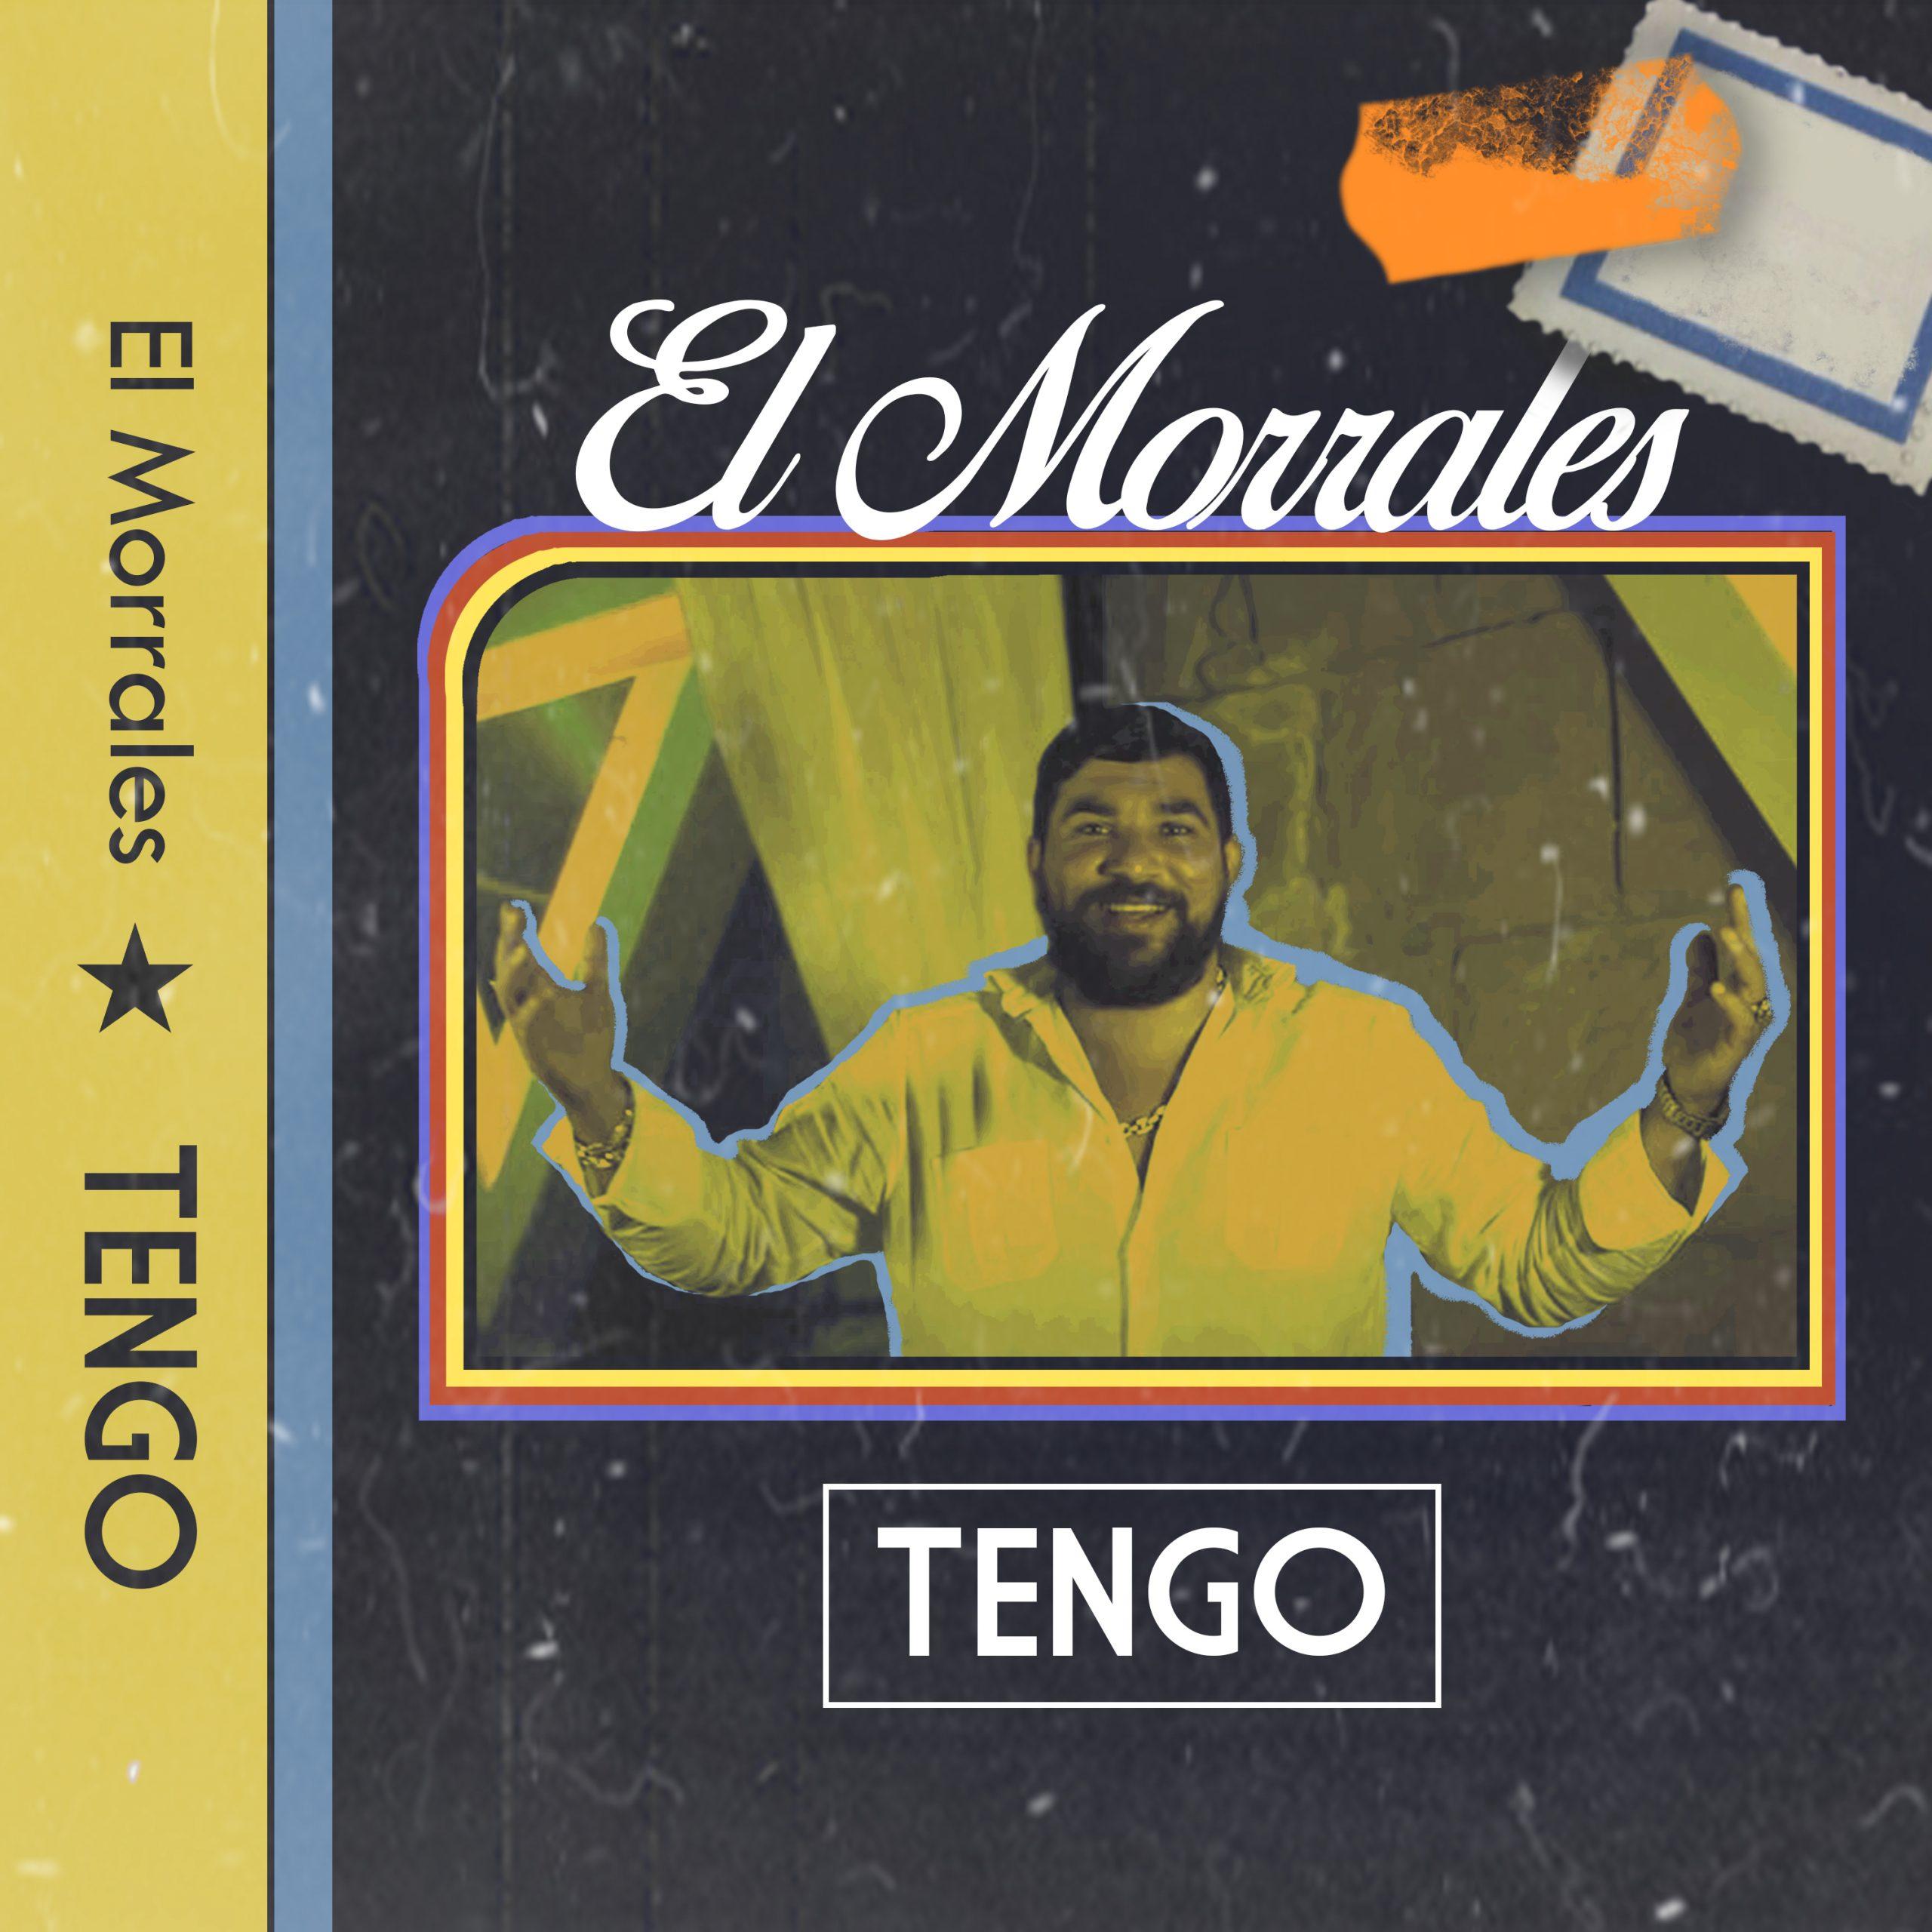 El Morrales - Tengo (Video)